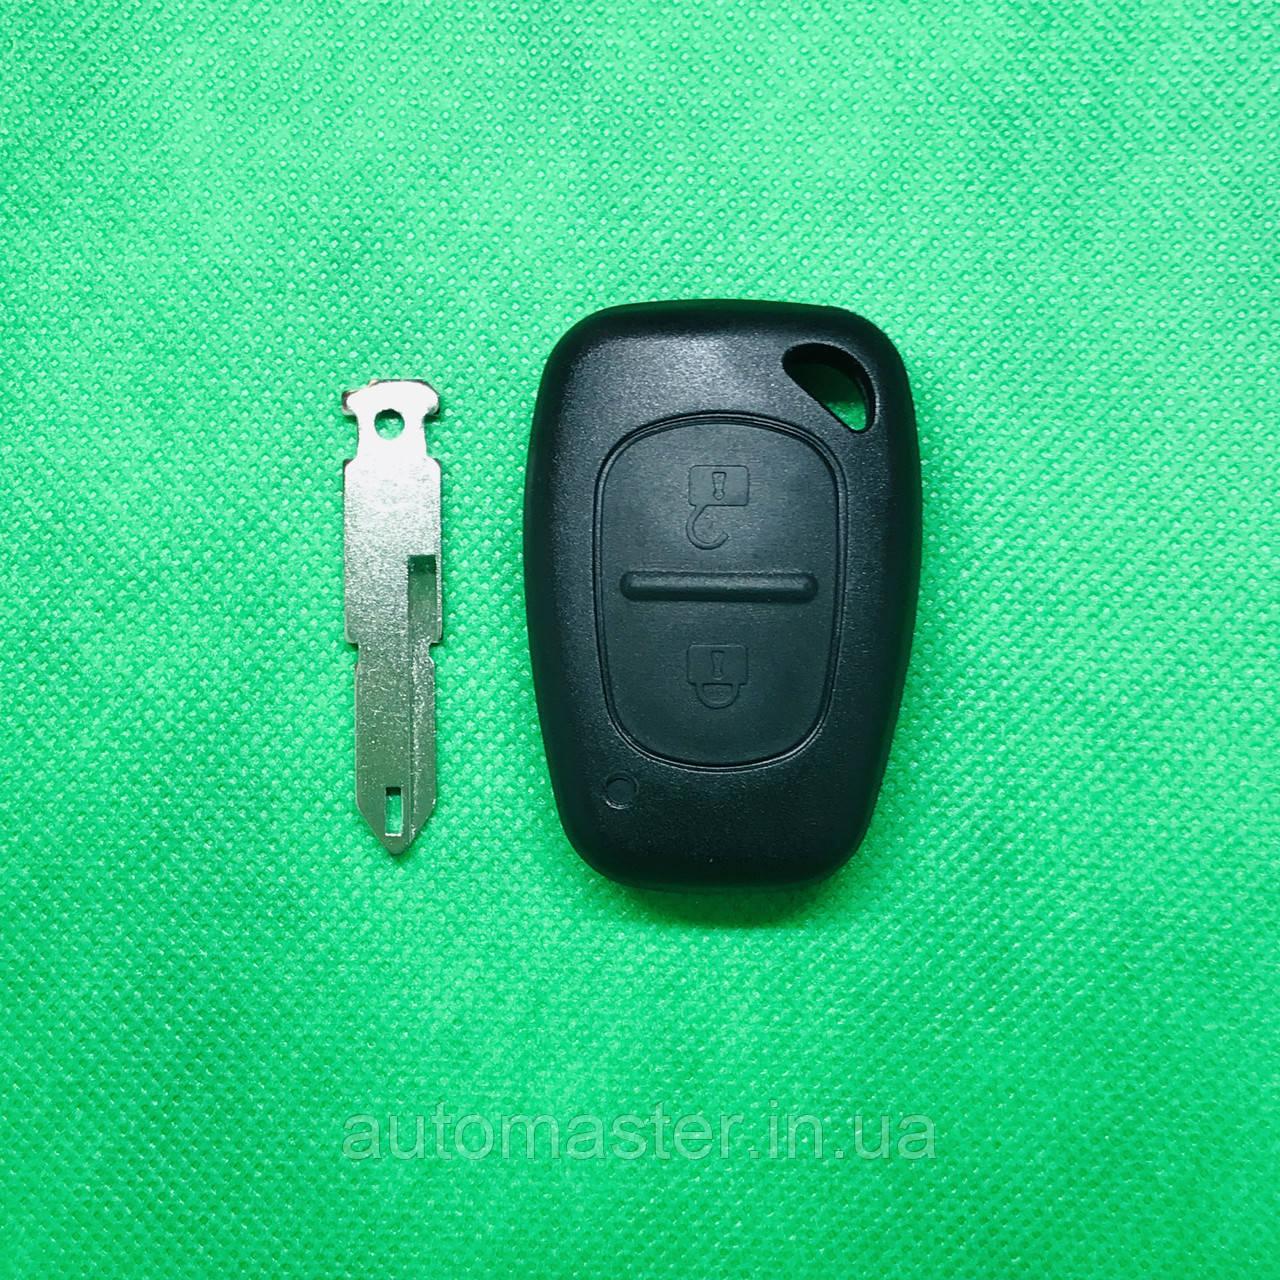 Корпус авто ключа Opel (Опель, Виваро) Мовано, MOVANO, VIVARO - 2кнопки, лезвие NE73